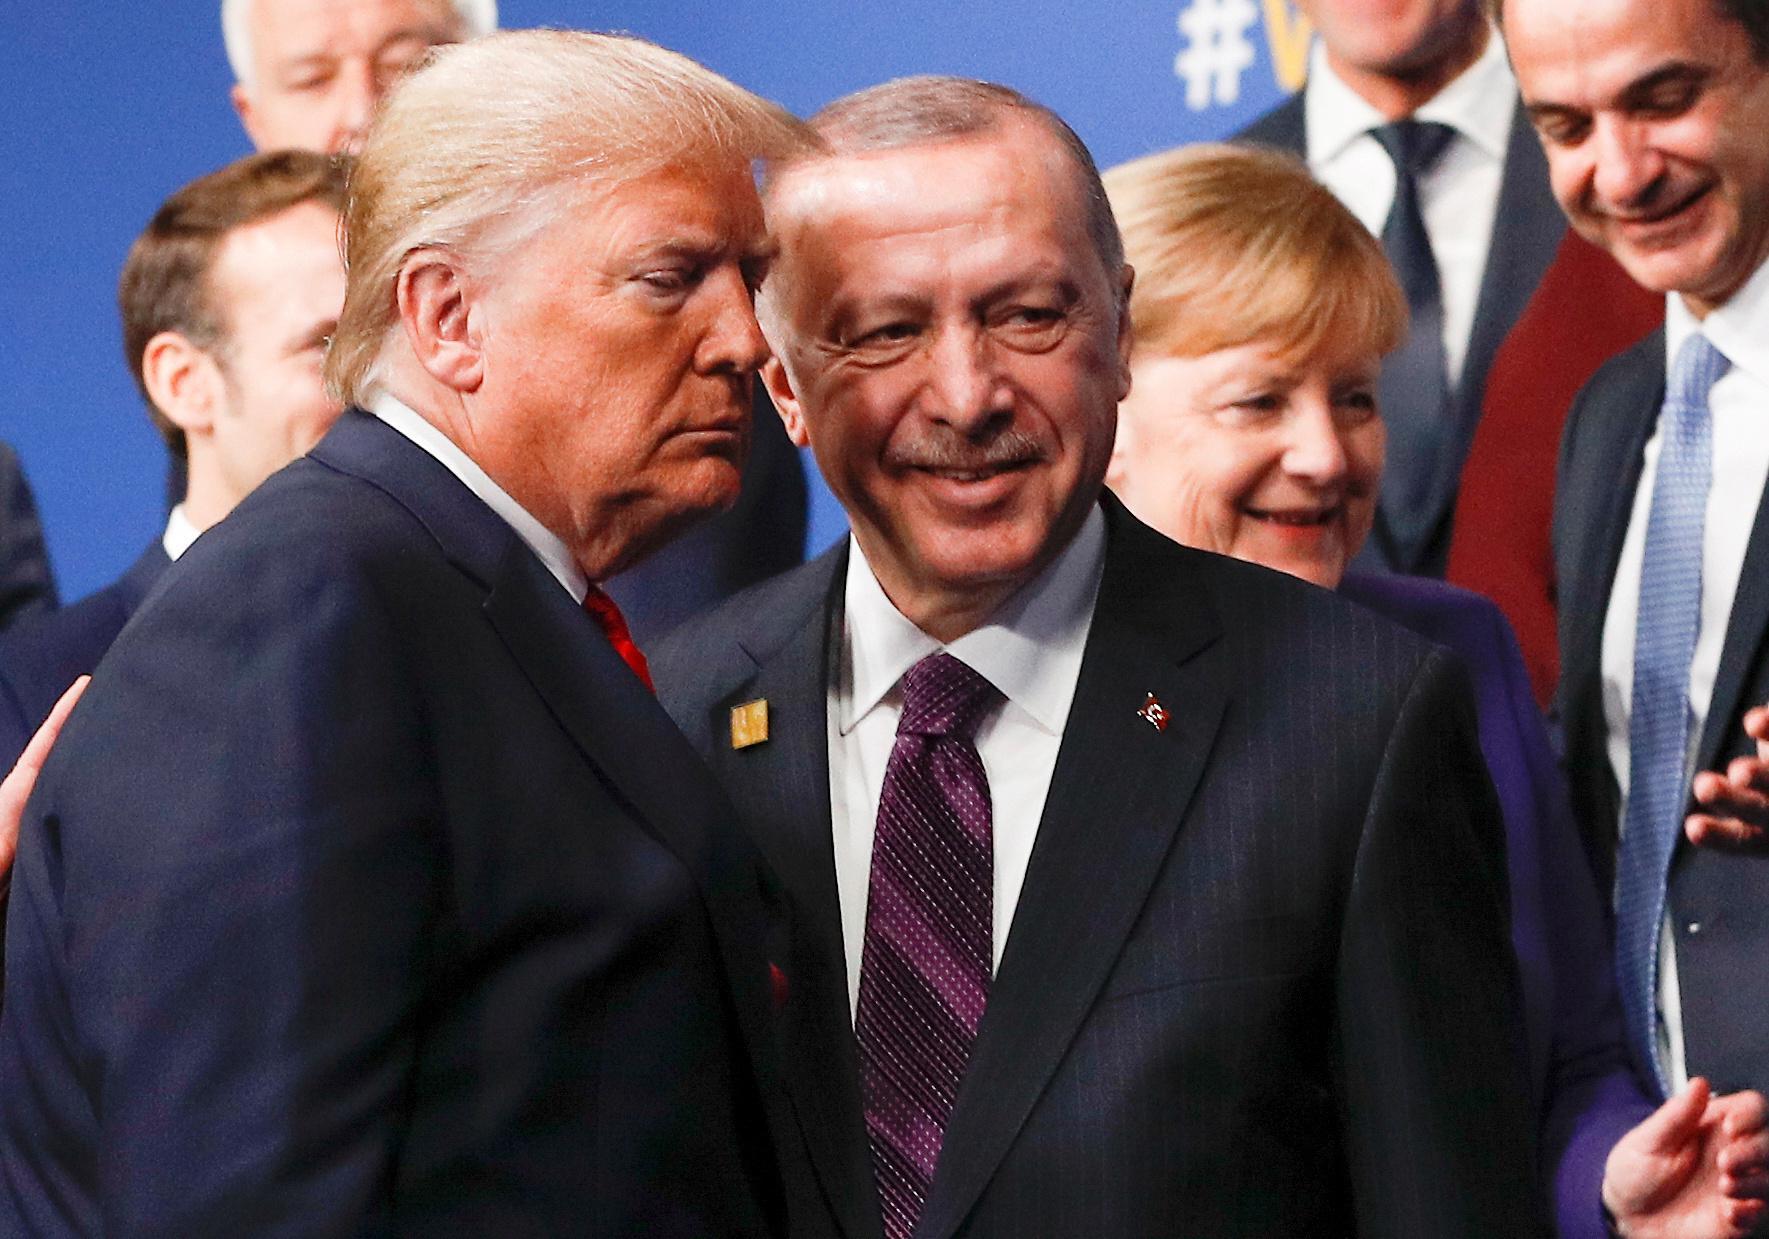 Turkey cannot go back on NATO Poland-Baltics plan: Polish official